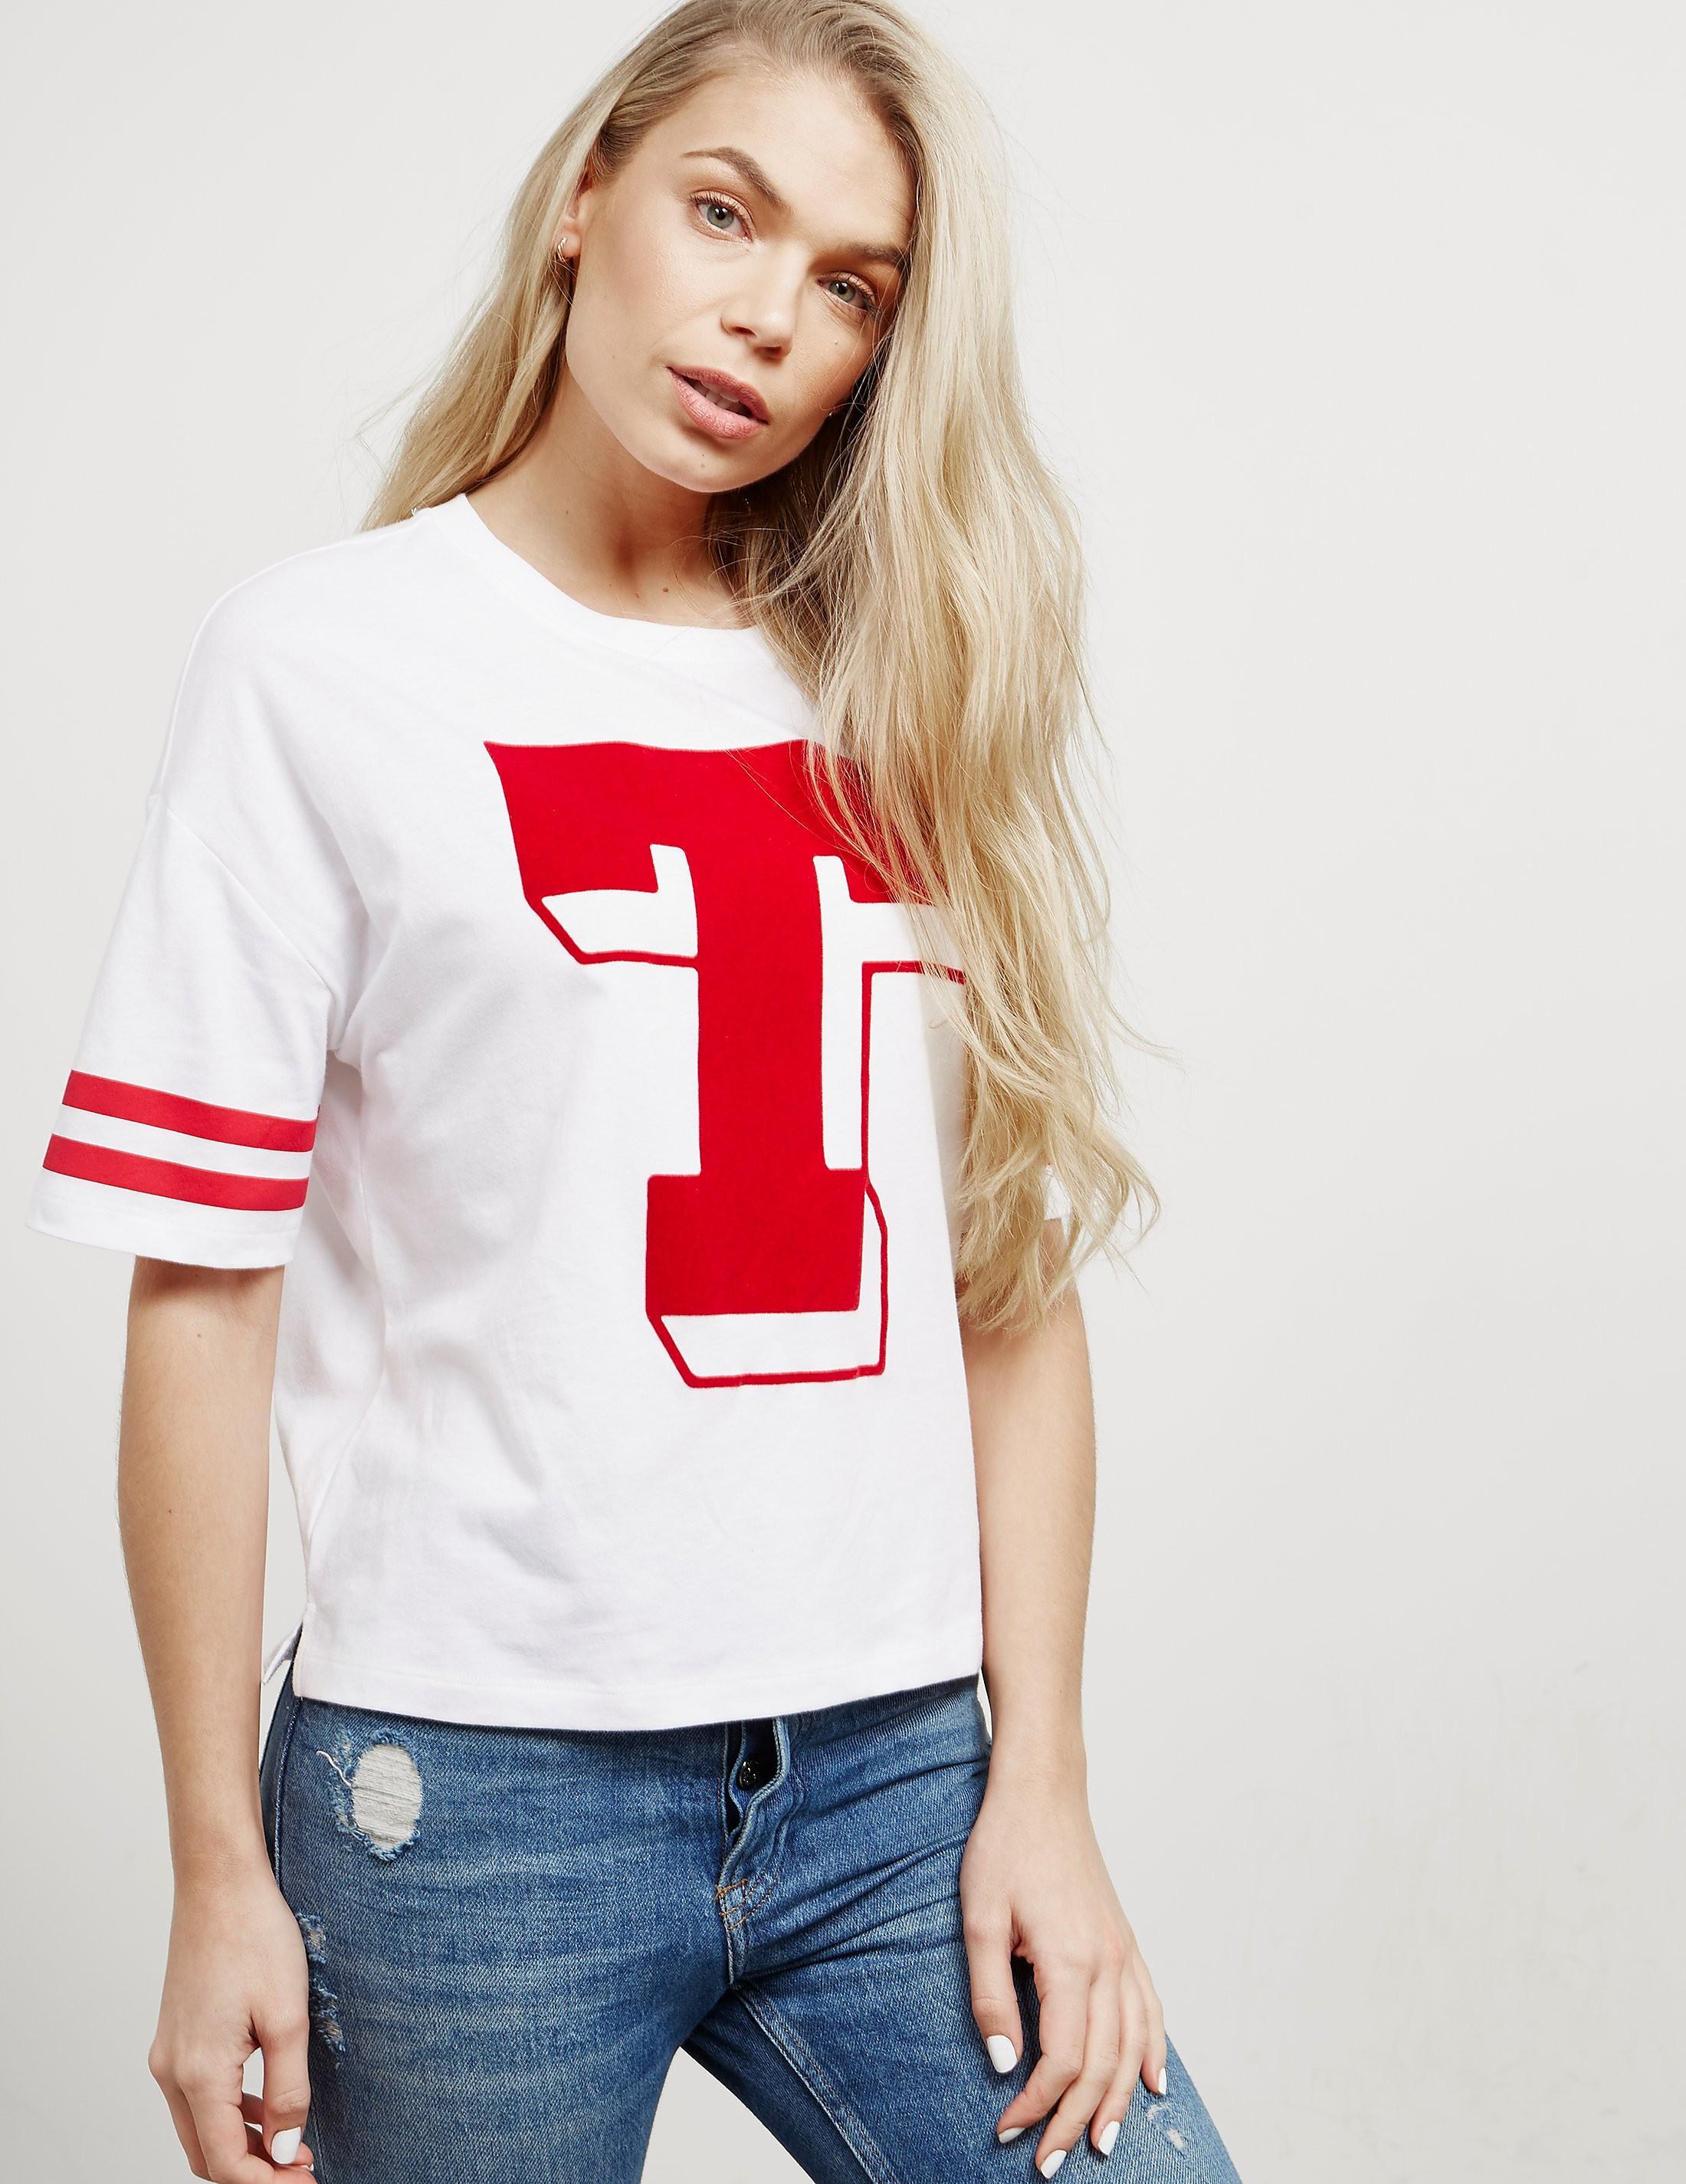 Tommy Hilfiger Oversized Short Sleeve T-Shirt